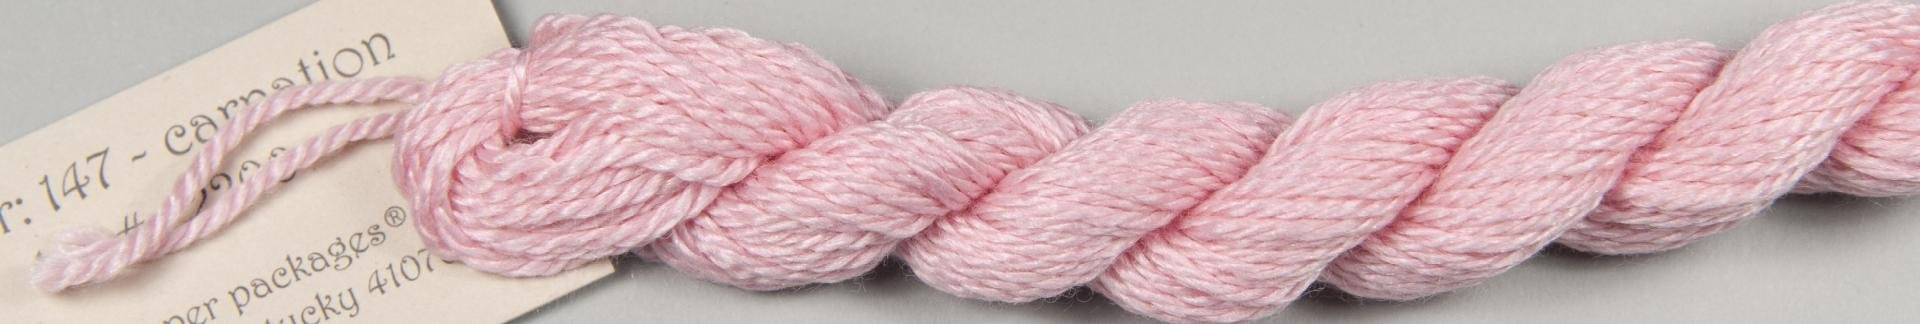 Silk & Ivory 147 Carnation